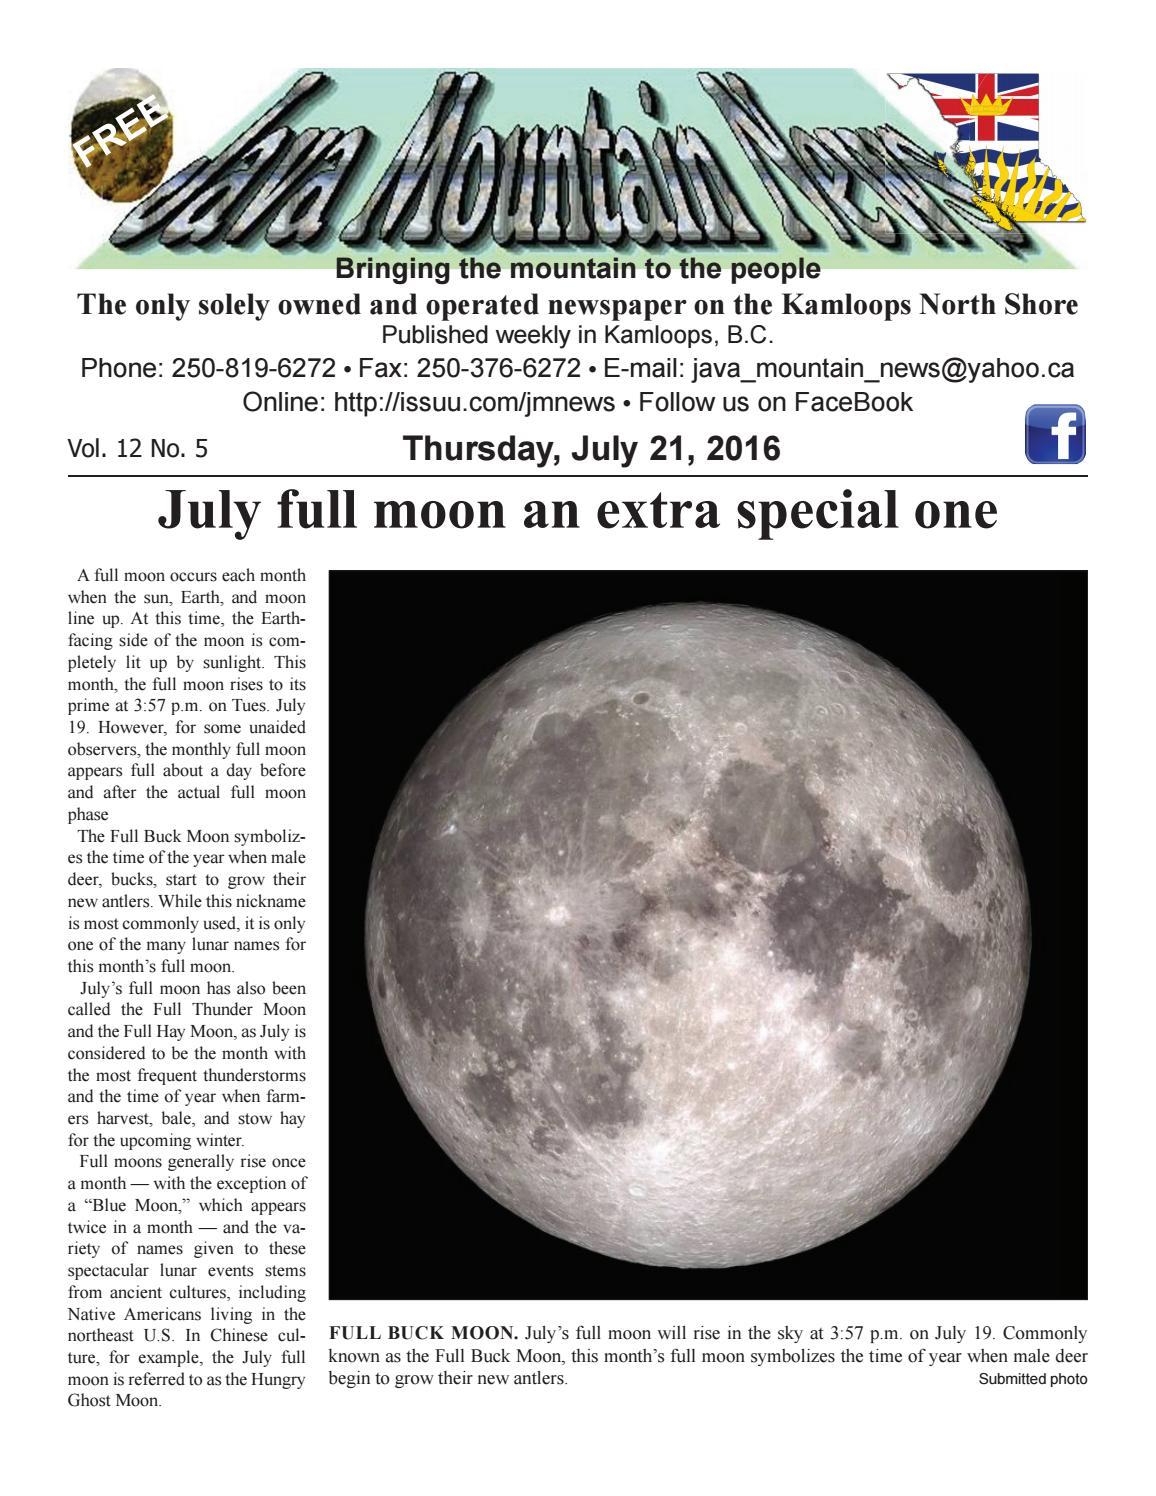 Jmnews july 21, 2016 by Java Mountain News - issuu